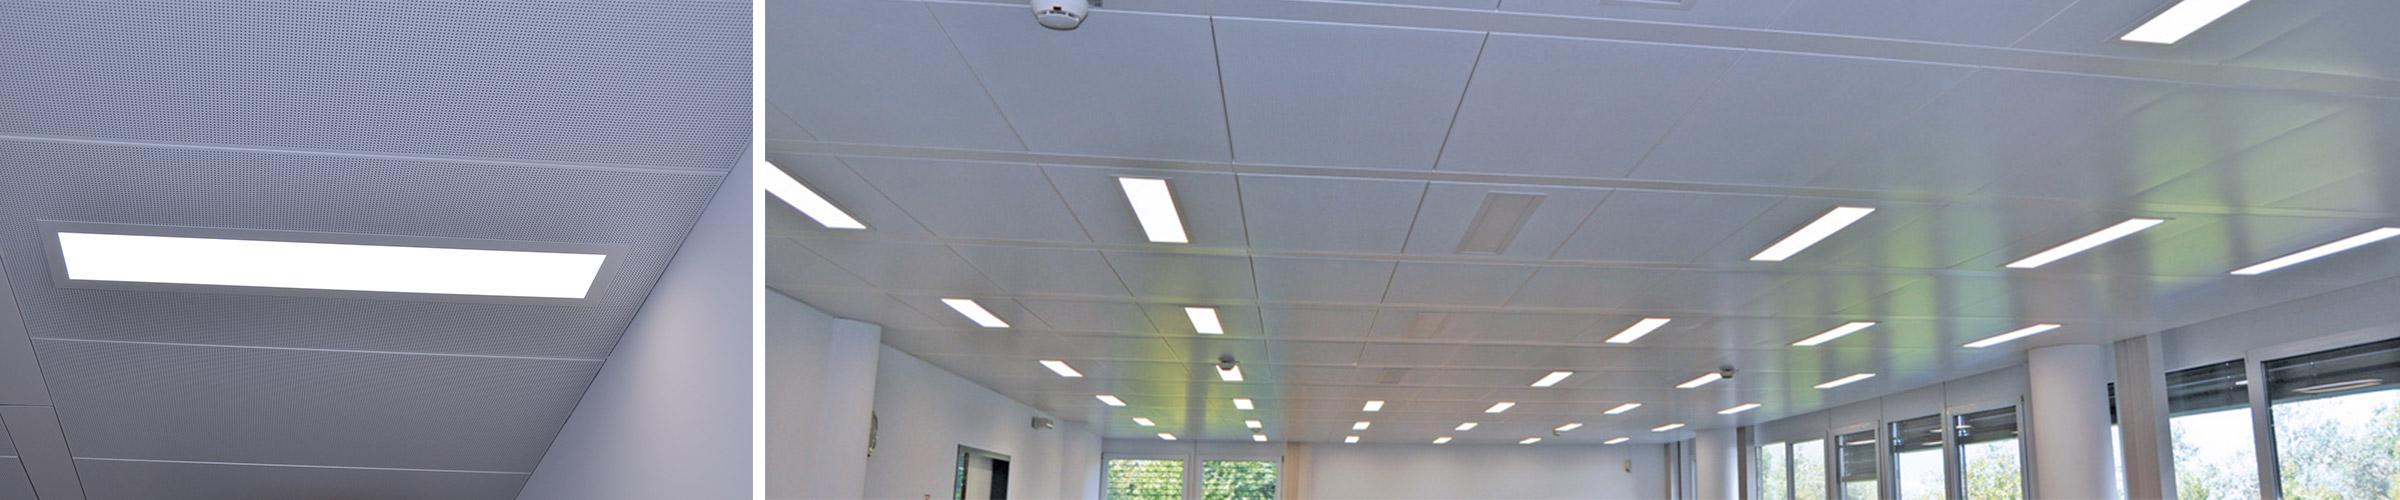 Büro Infineon mit SML LED Produkten